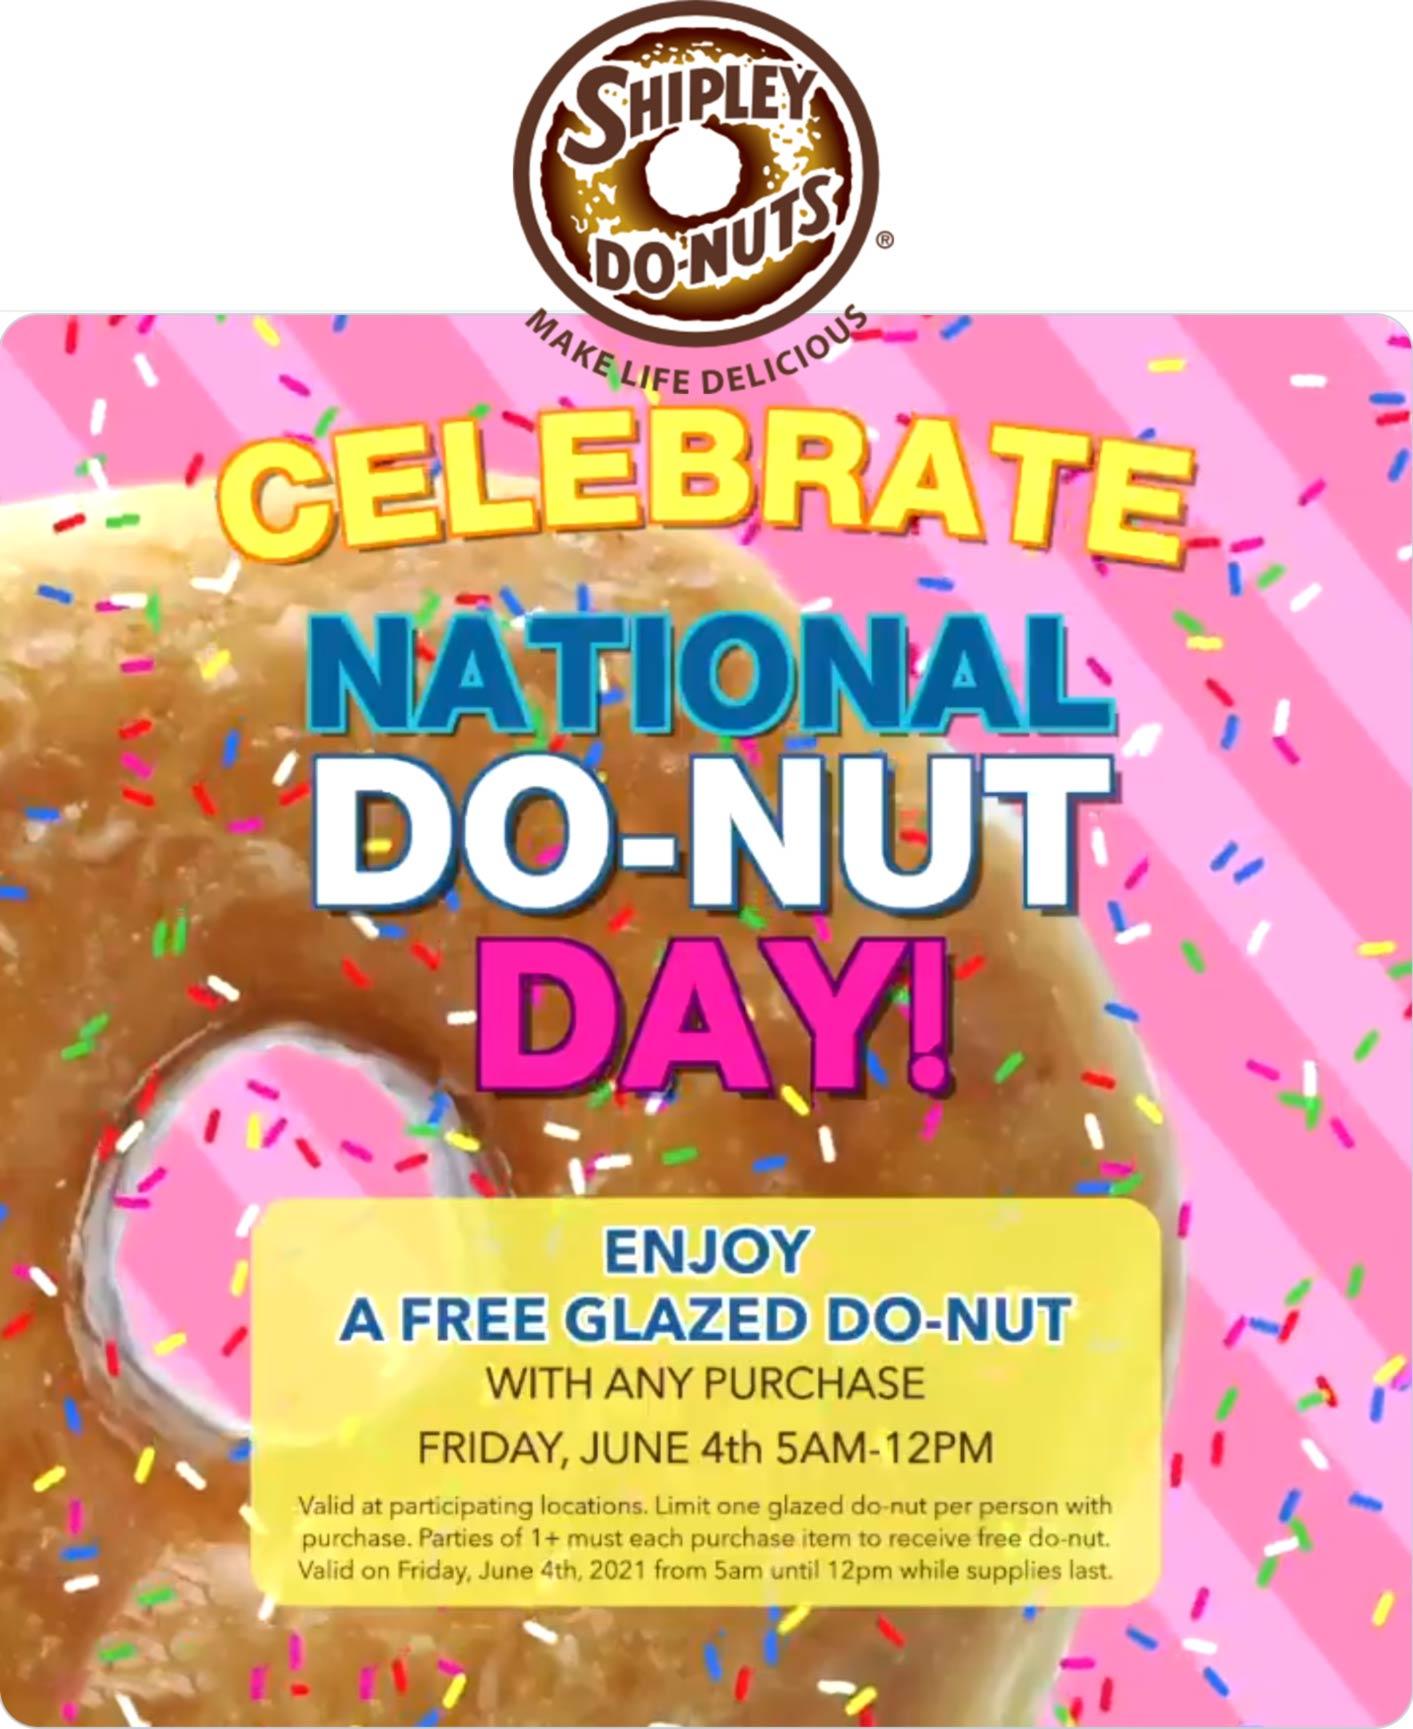 Shipley Do-Nuts restaurants Coupon  Free glazed donut today at Shipley Do-Nuts #shipleydonuts